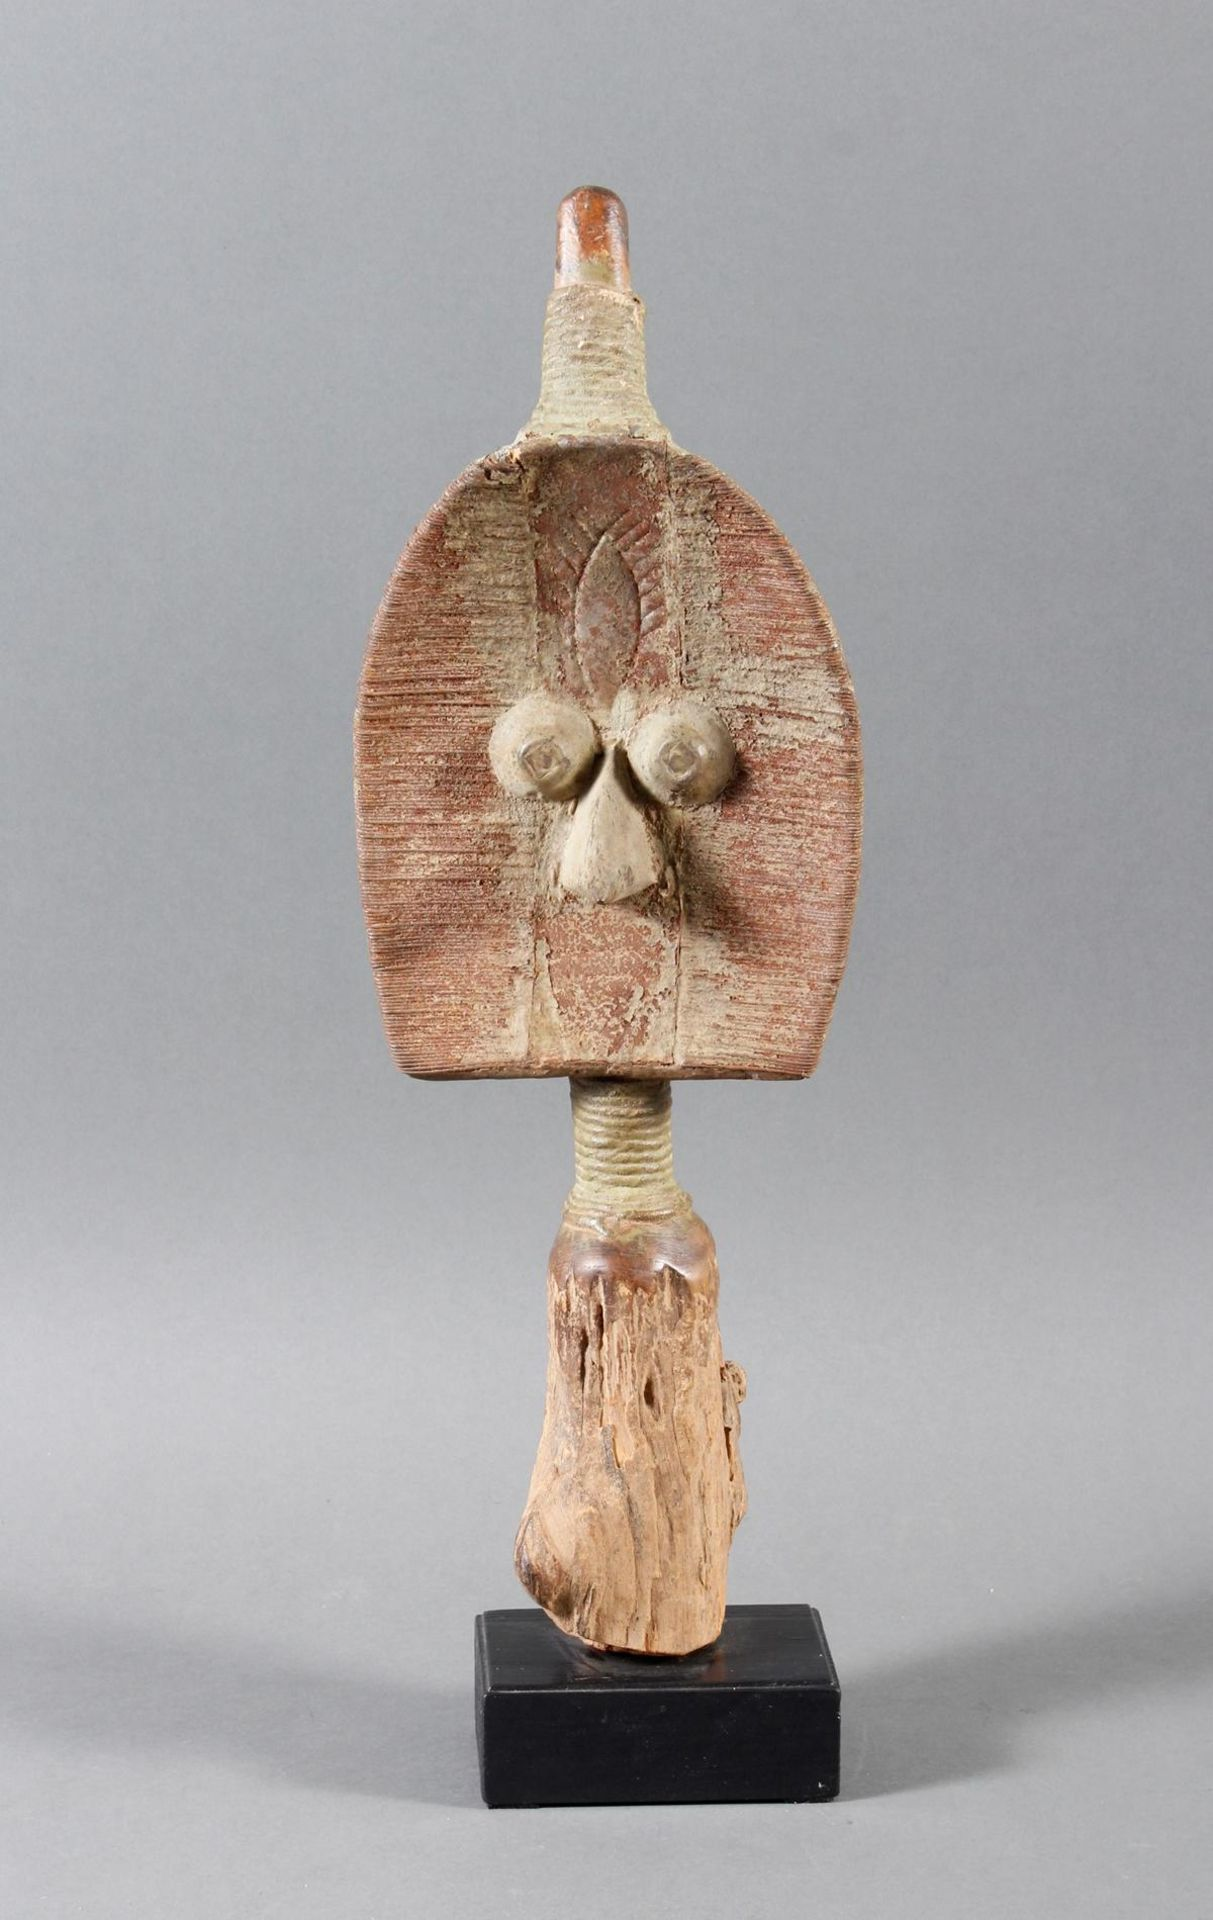 Grabwächter, Reliquiarfigur, Mahongwe / Gabun